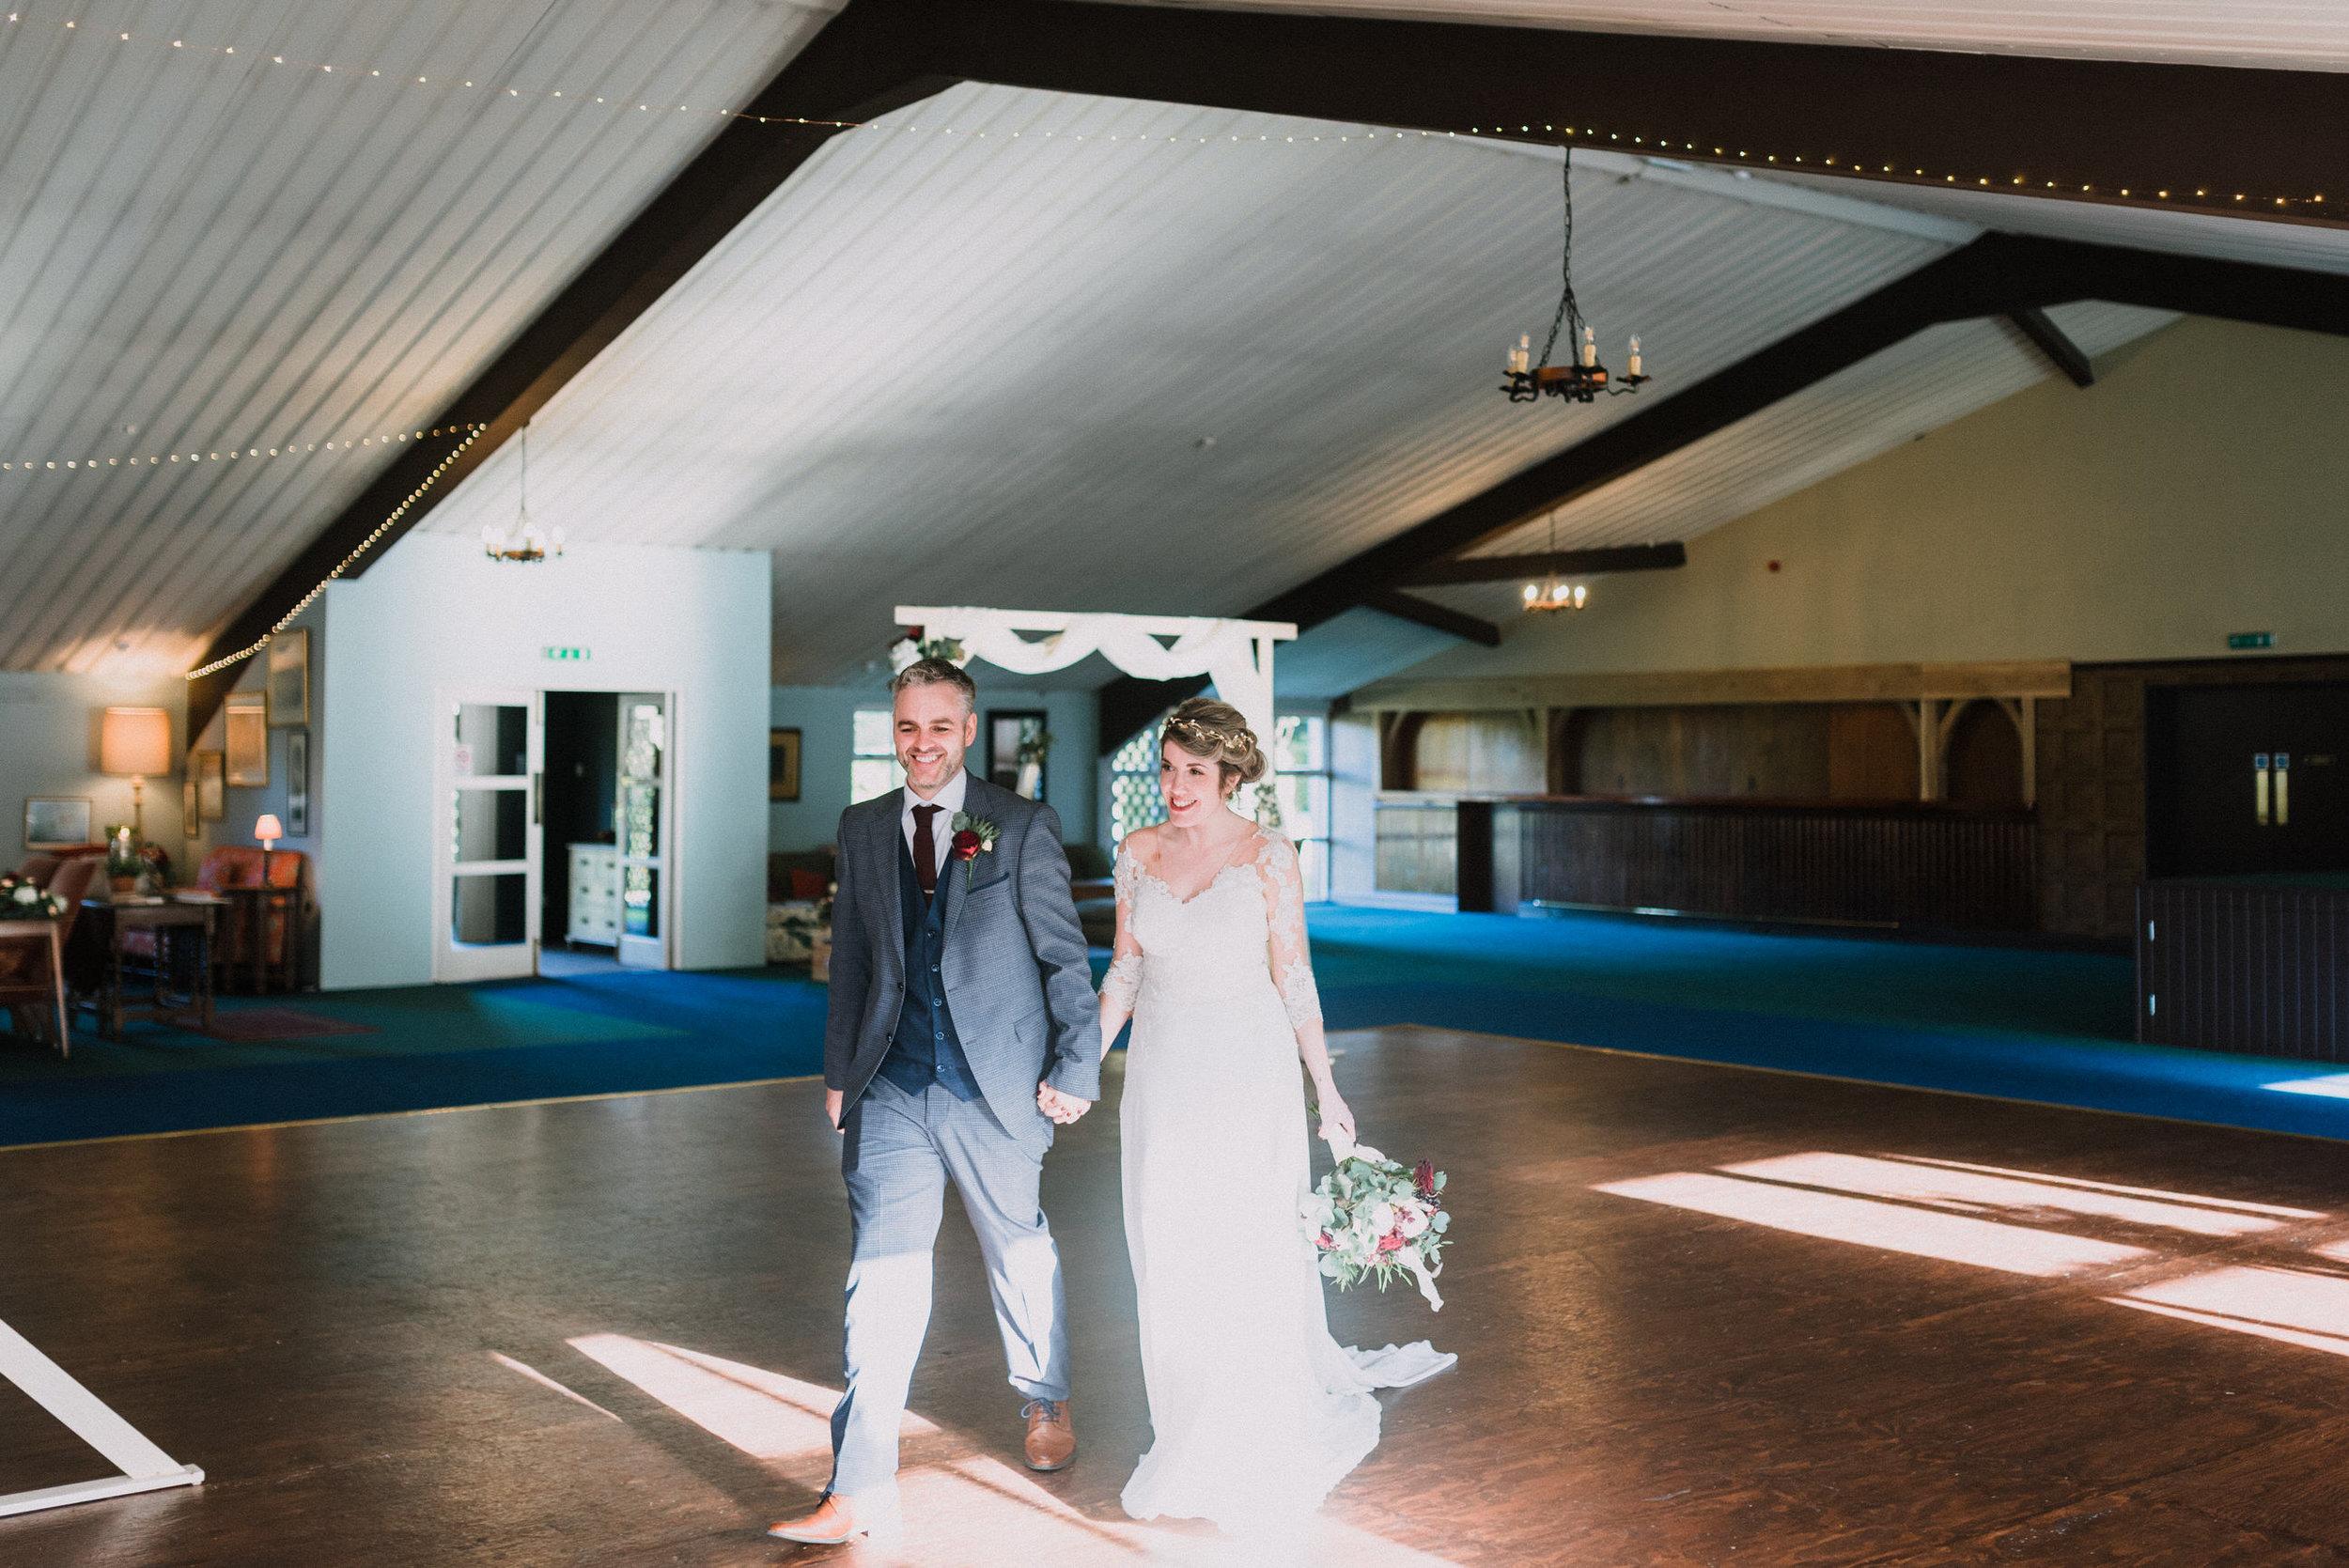 lissanoure castle wedding, northern ireland wedding photographer, romantic northern irish wedding venue, castle wedding ireland, natural wedding photography ni (105).jpg